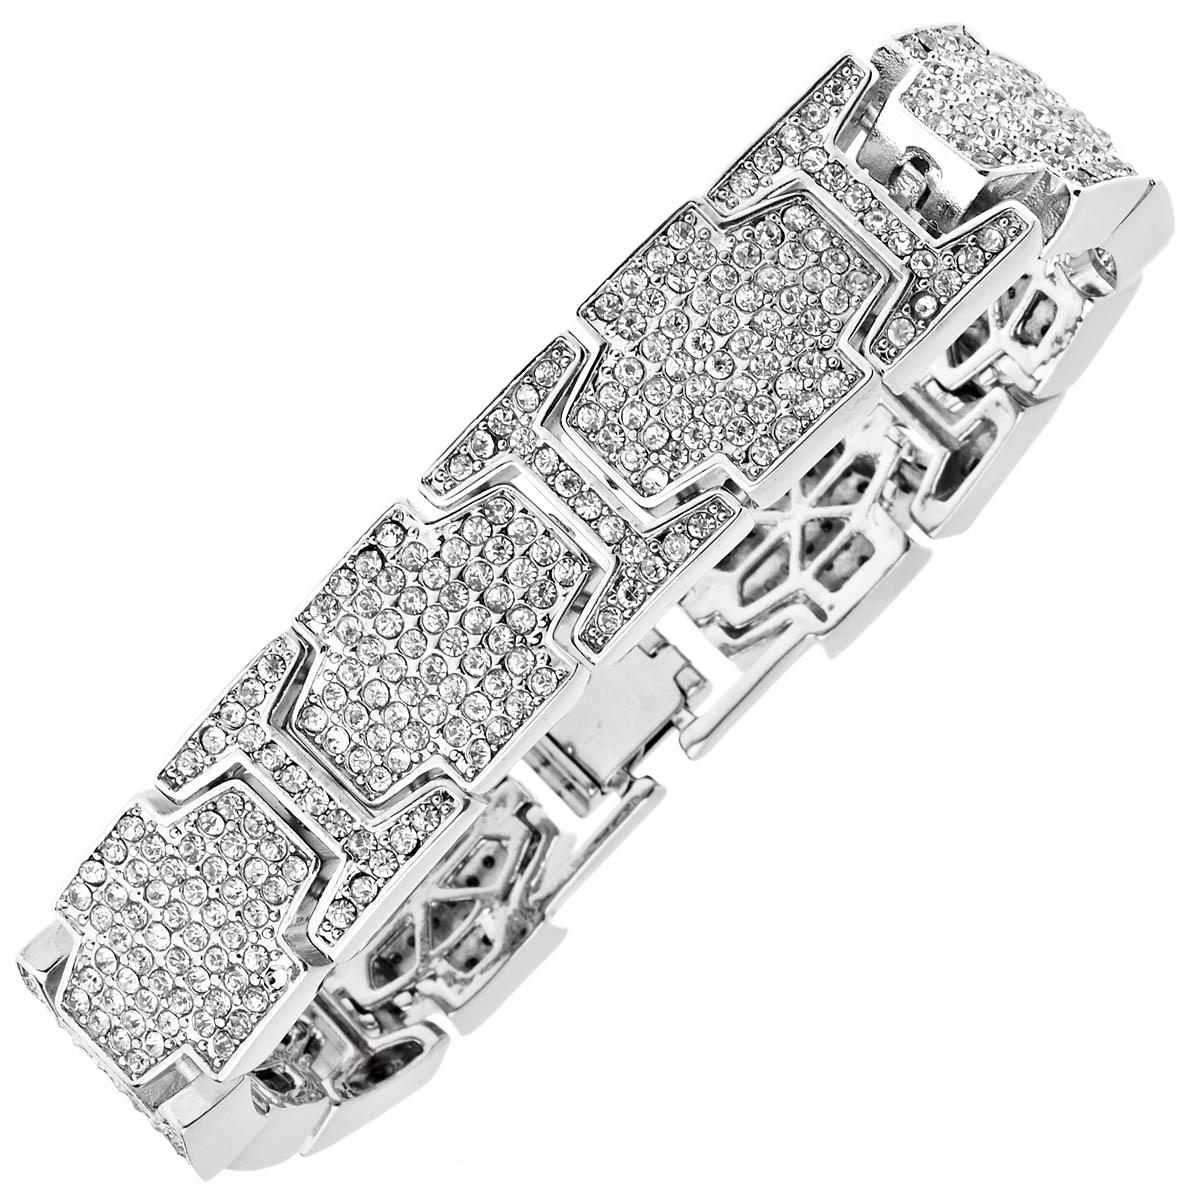 Iced Out Bling Hip Hop Diamond Bracelet Ice Link